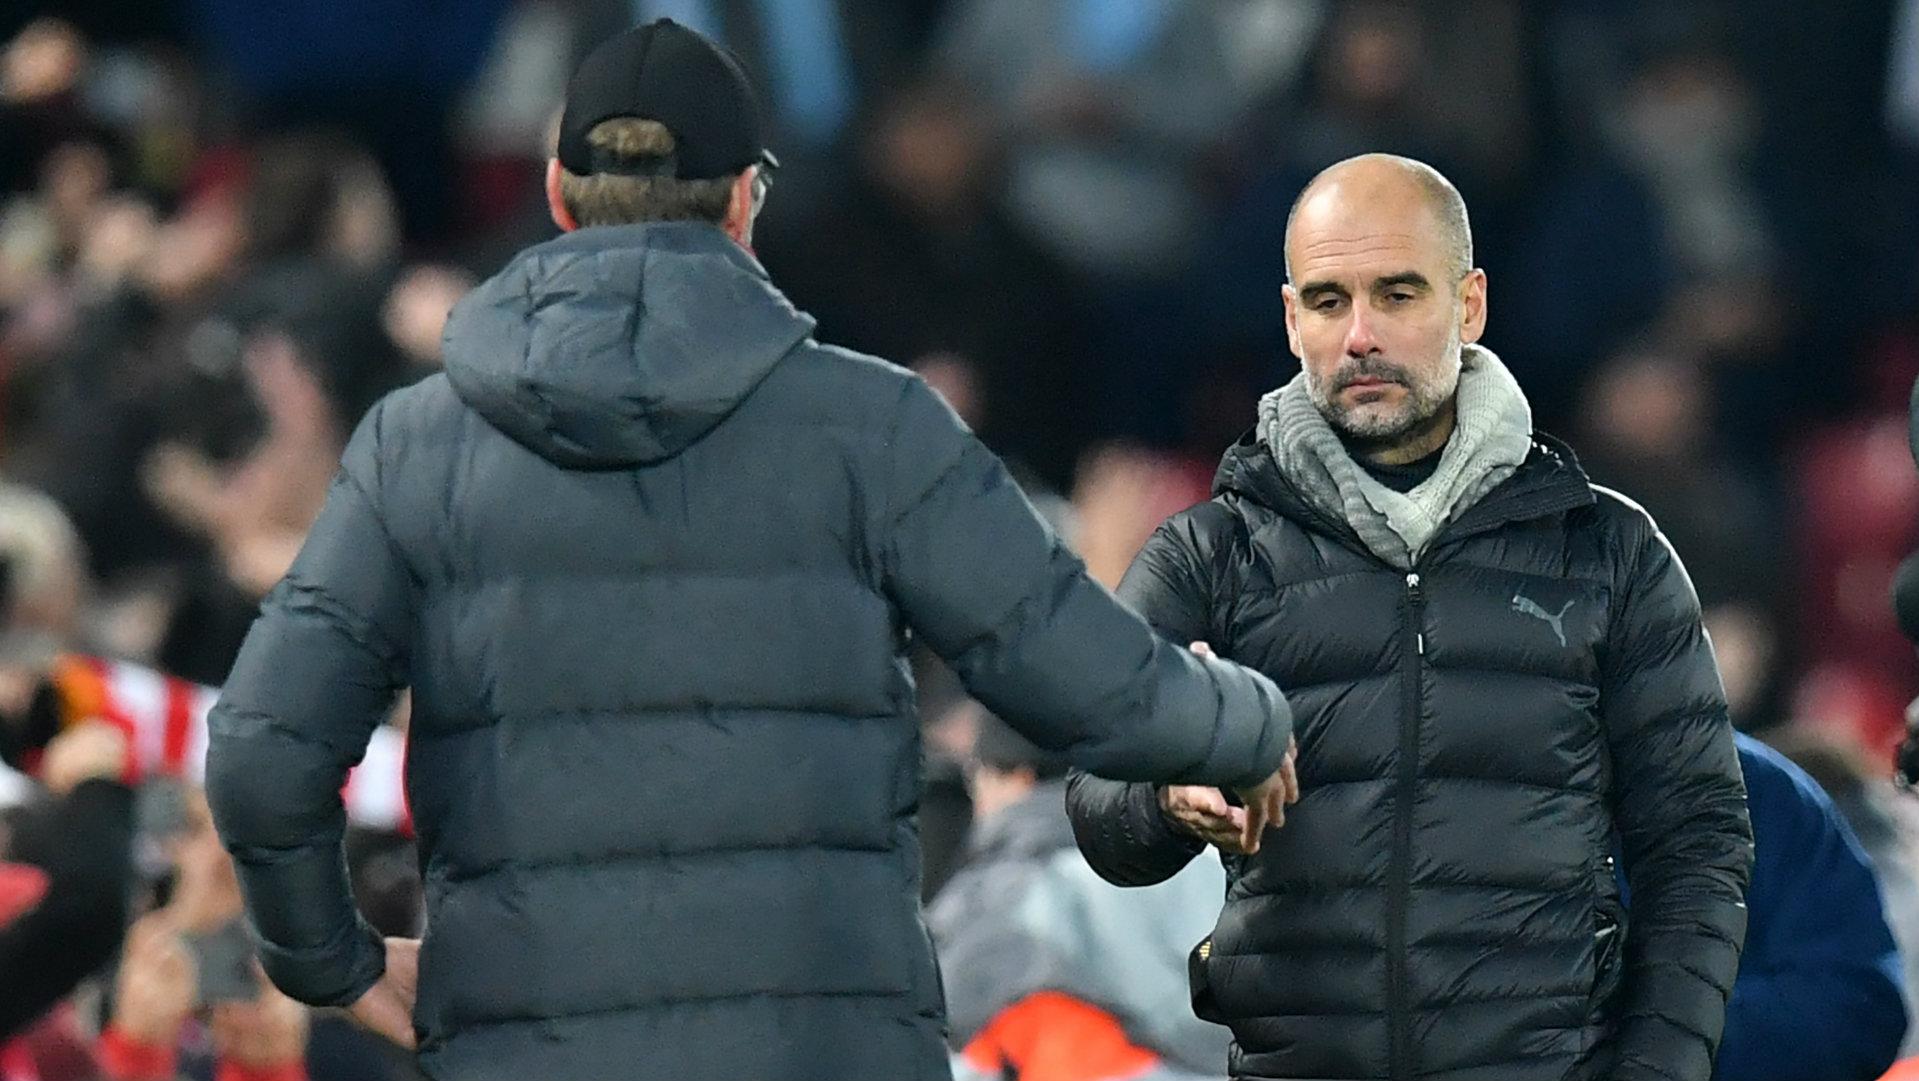 Pep Guardiola Liverpool vs Man City 2019-20